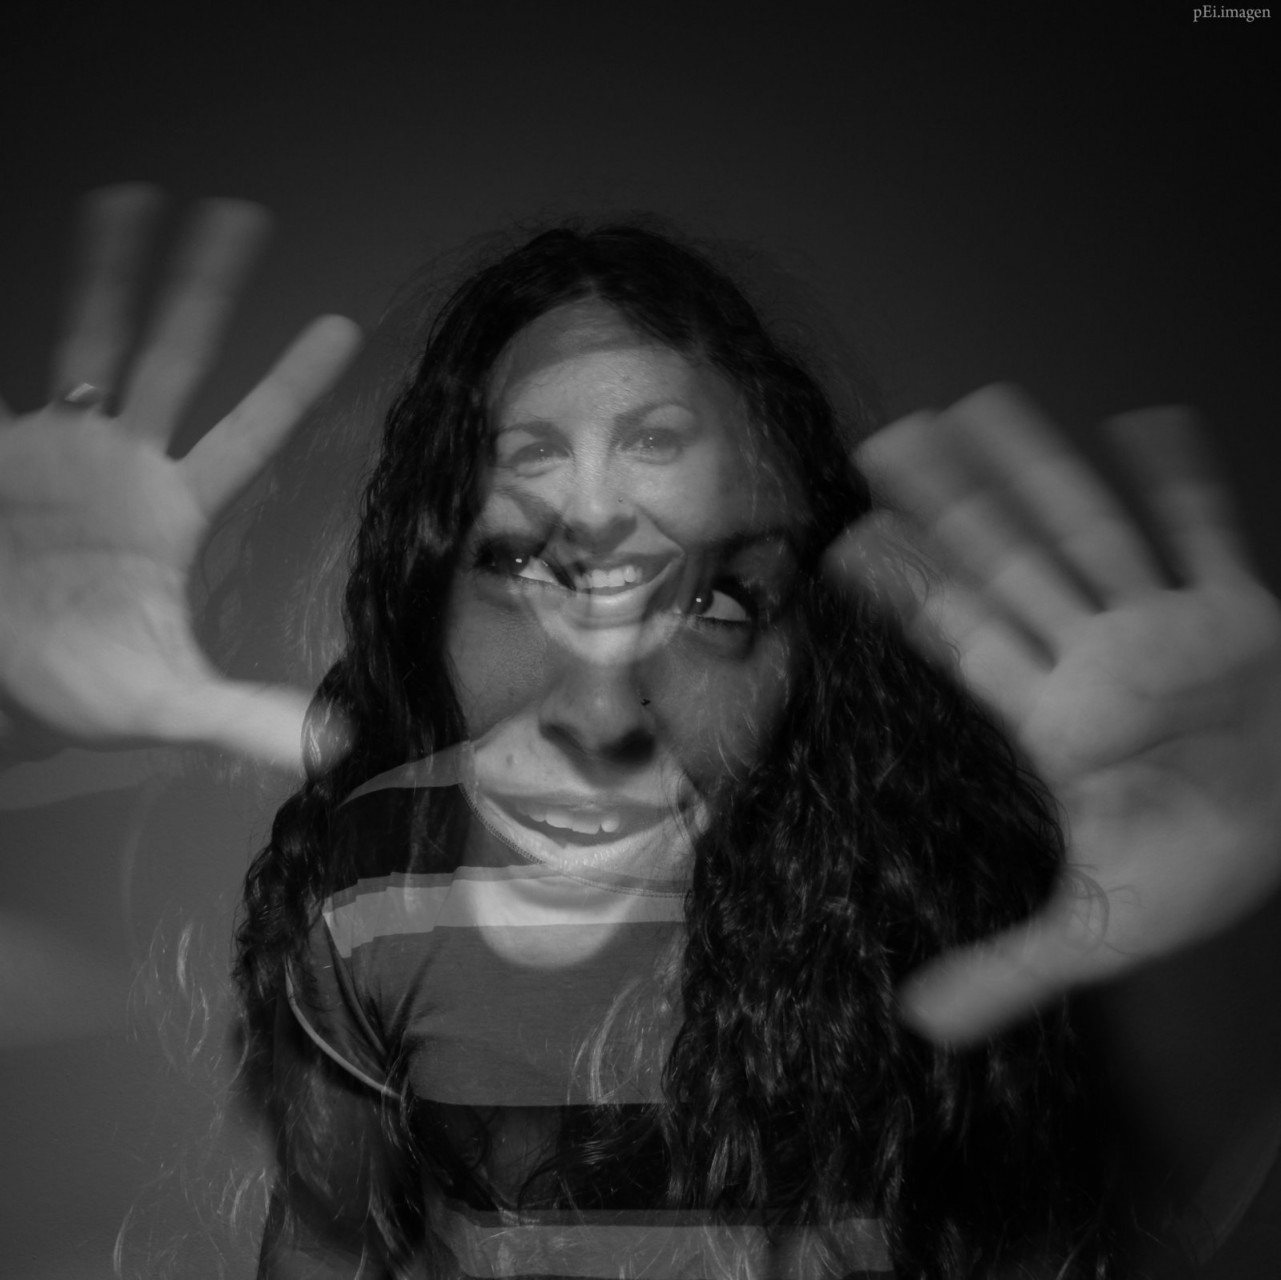 peipegata me myself I proyectos fotografia peipegatafotografia # 032 Laura Pizarro